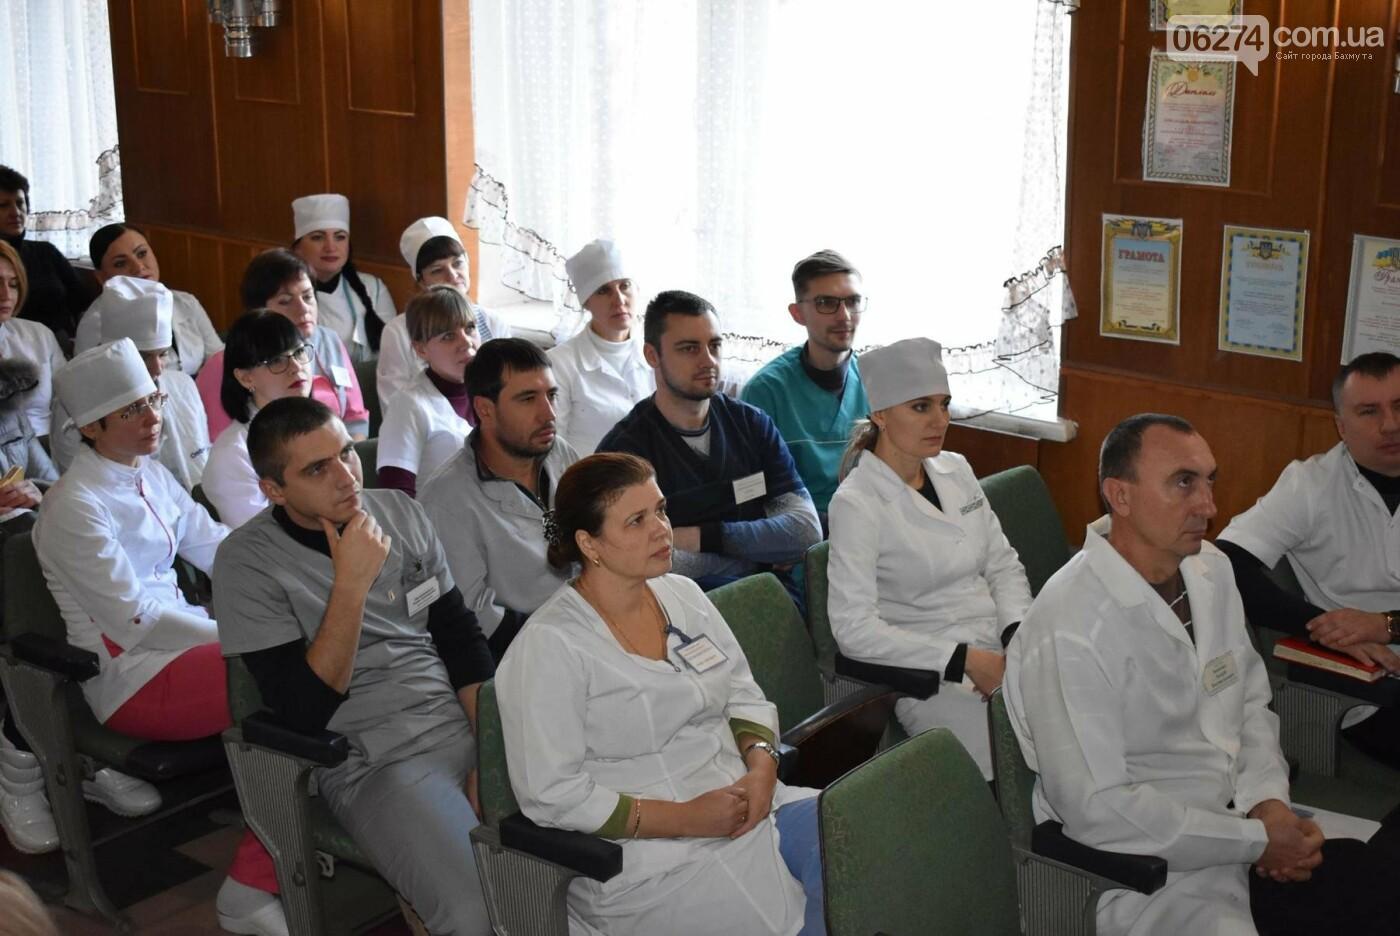 Мэр Бахмута Алексей Рева провел рабочую встречу с коллективом стоматполиклиники, фото-2